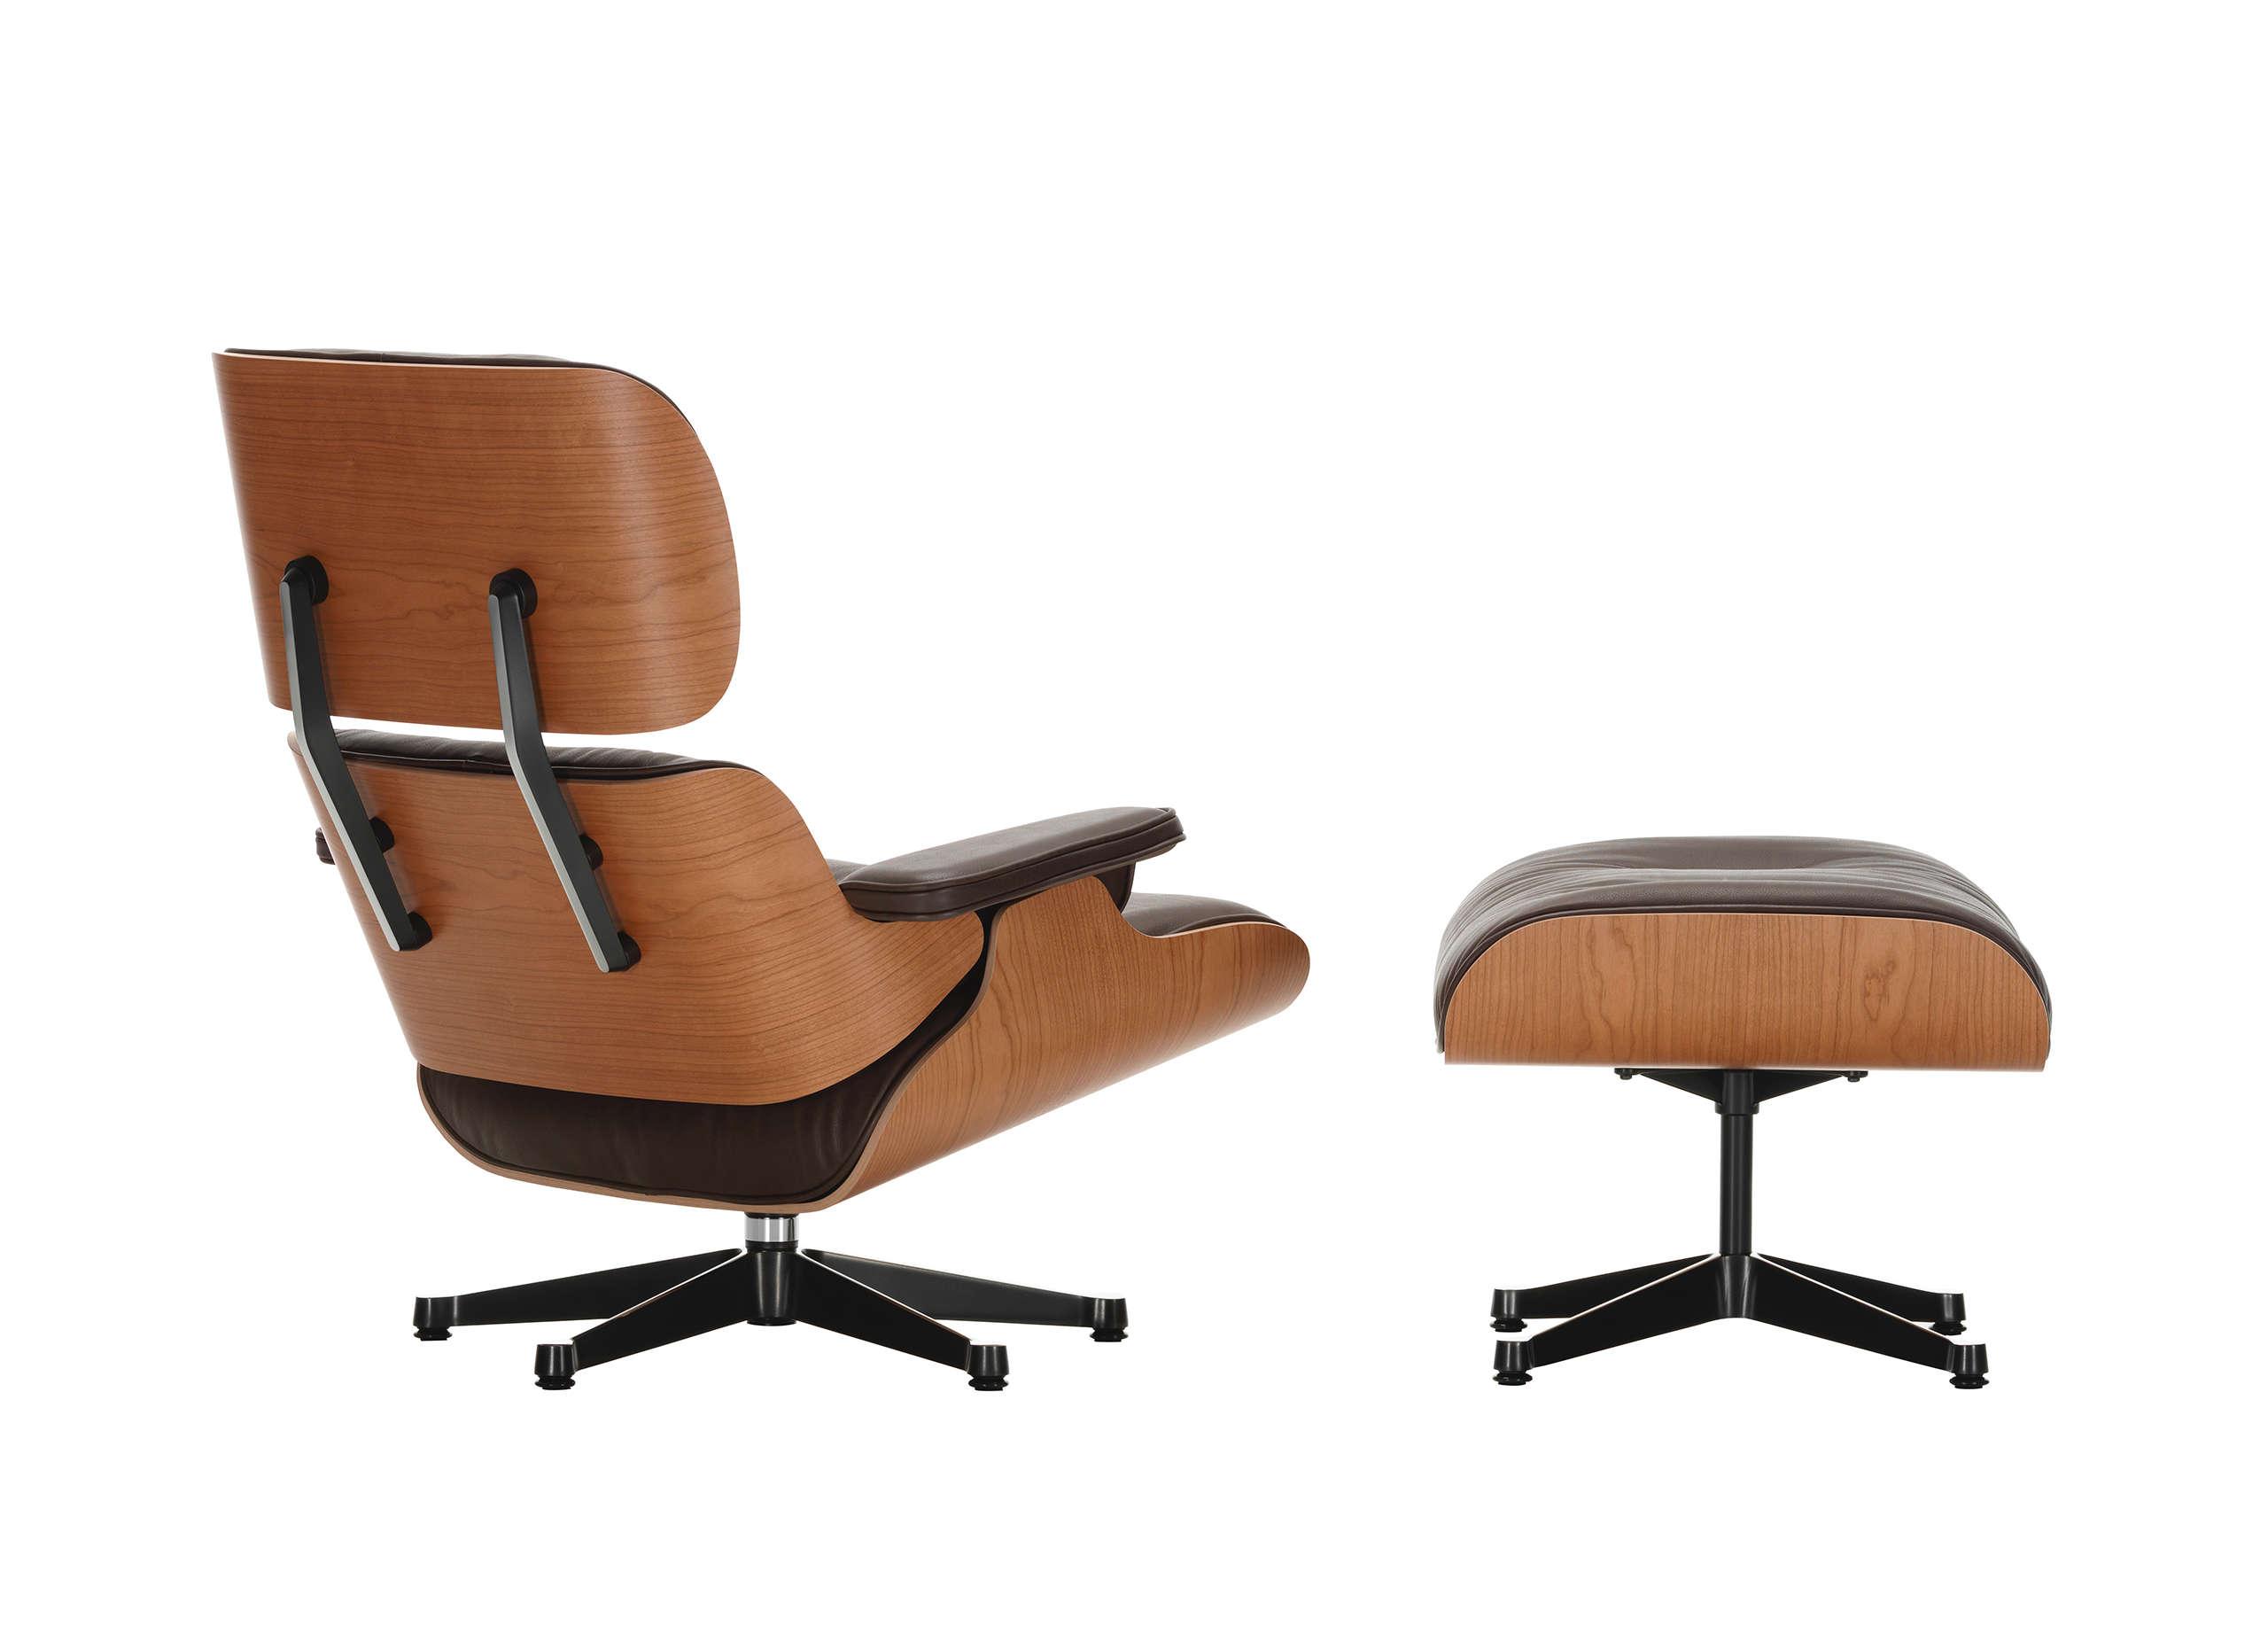 Eames Sessel amazing lounge chair set pictures struktura struktura